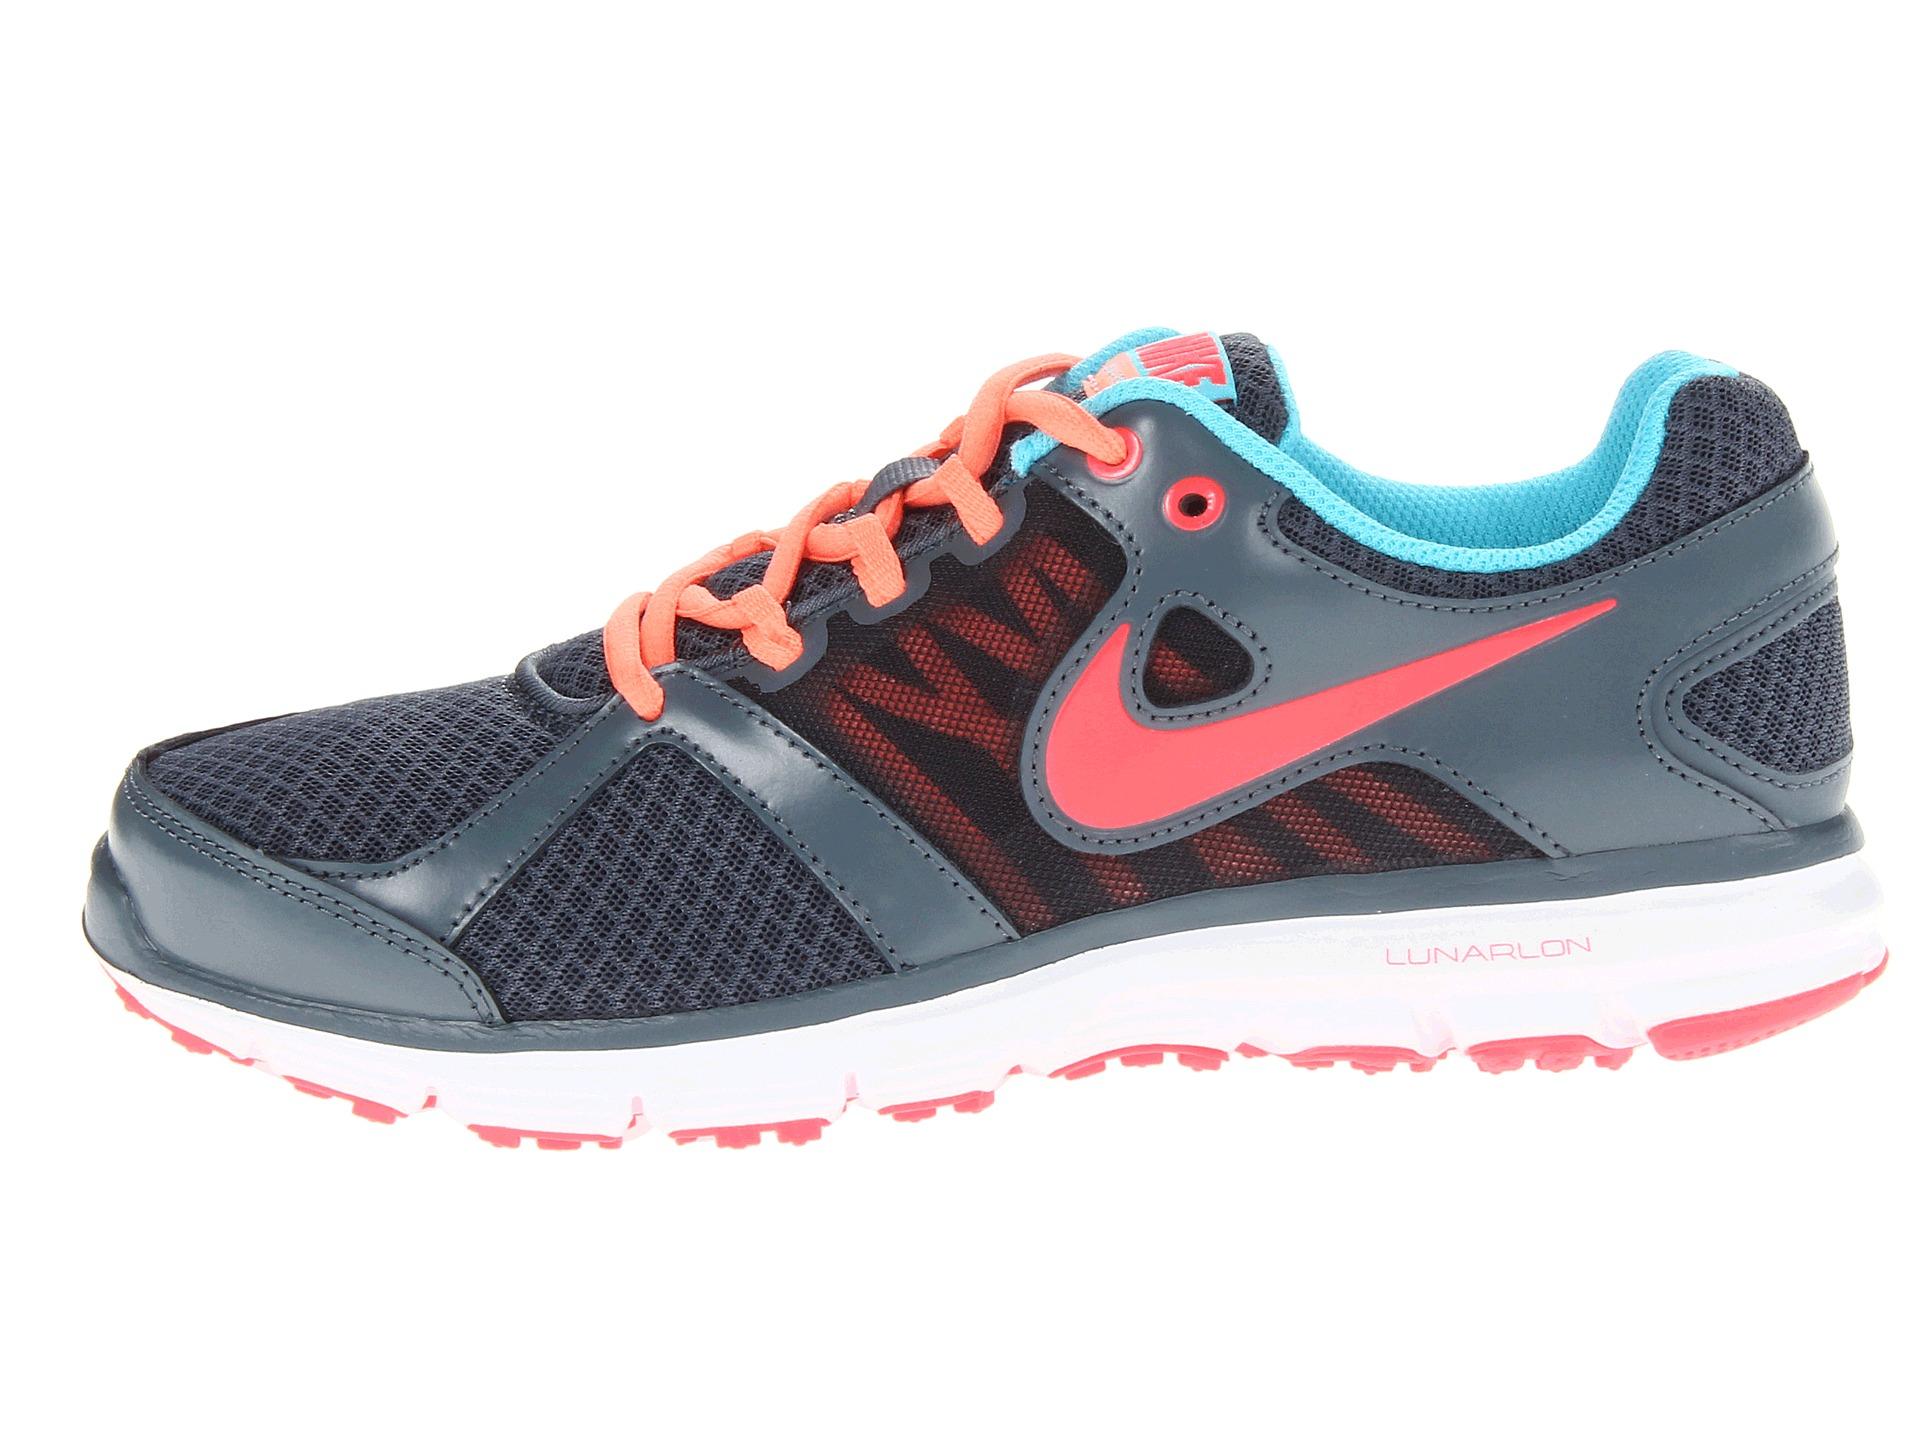 vente authentique rabais de dédouanement Nike Lunarelite 2 Zappos atqRcVQjhU